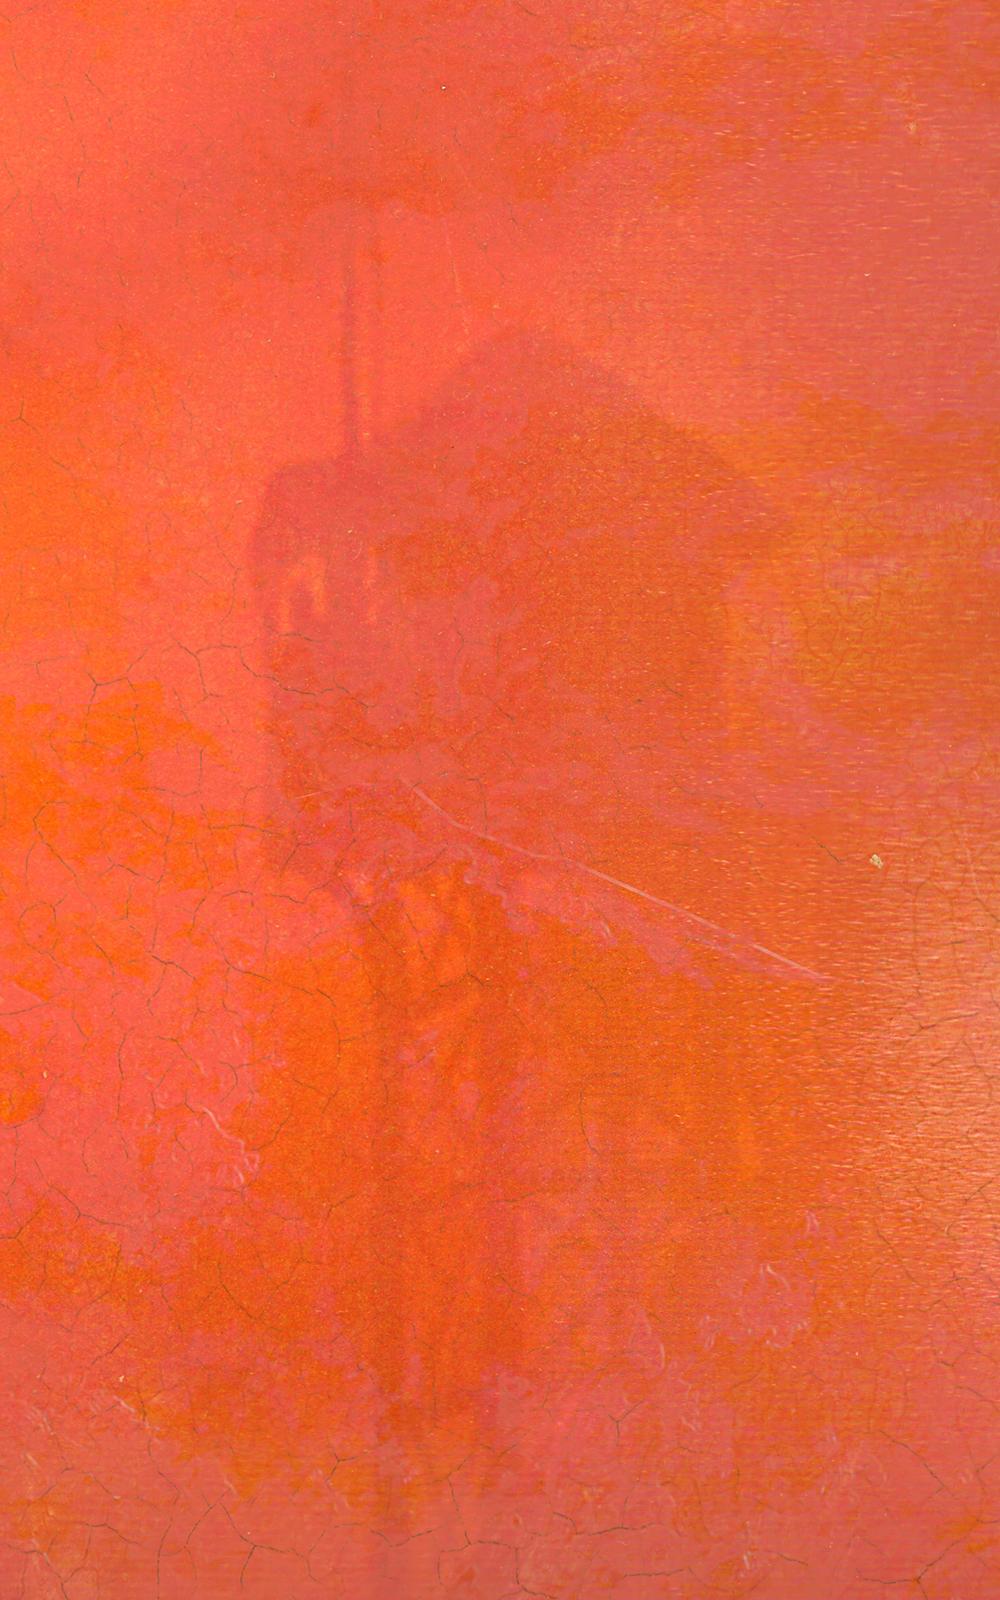 Case Simmons, Simmons & Burke, If Not Winter Composite #4, Kohn Gallery, Composite Image, Lightjet Print, Digital Collage,Digital Art, Photoshop Collage, Contemporary Collage,Case Simmons Art, Case Simmons Artist, Collage Fine Art, Hyper Collage, Digital Painting,Digital Landscape